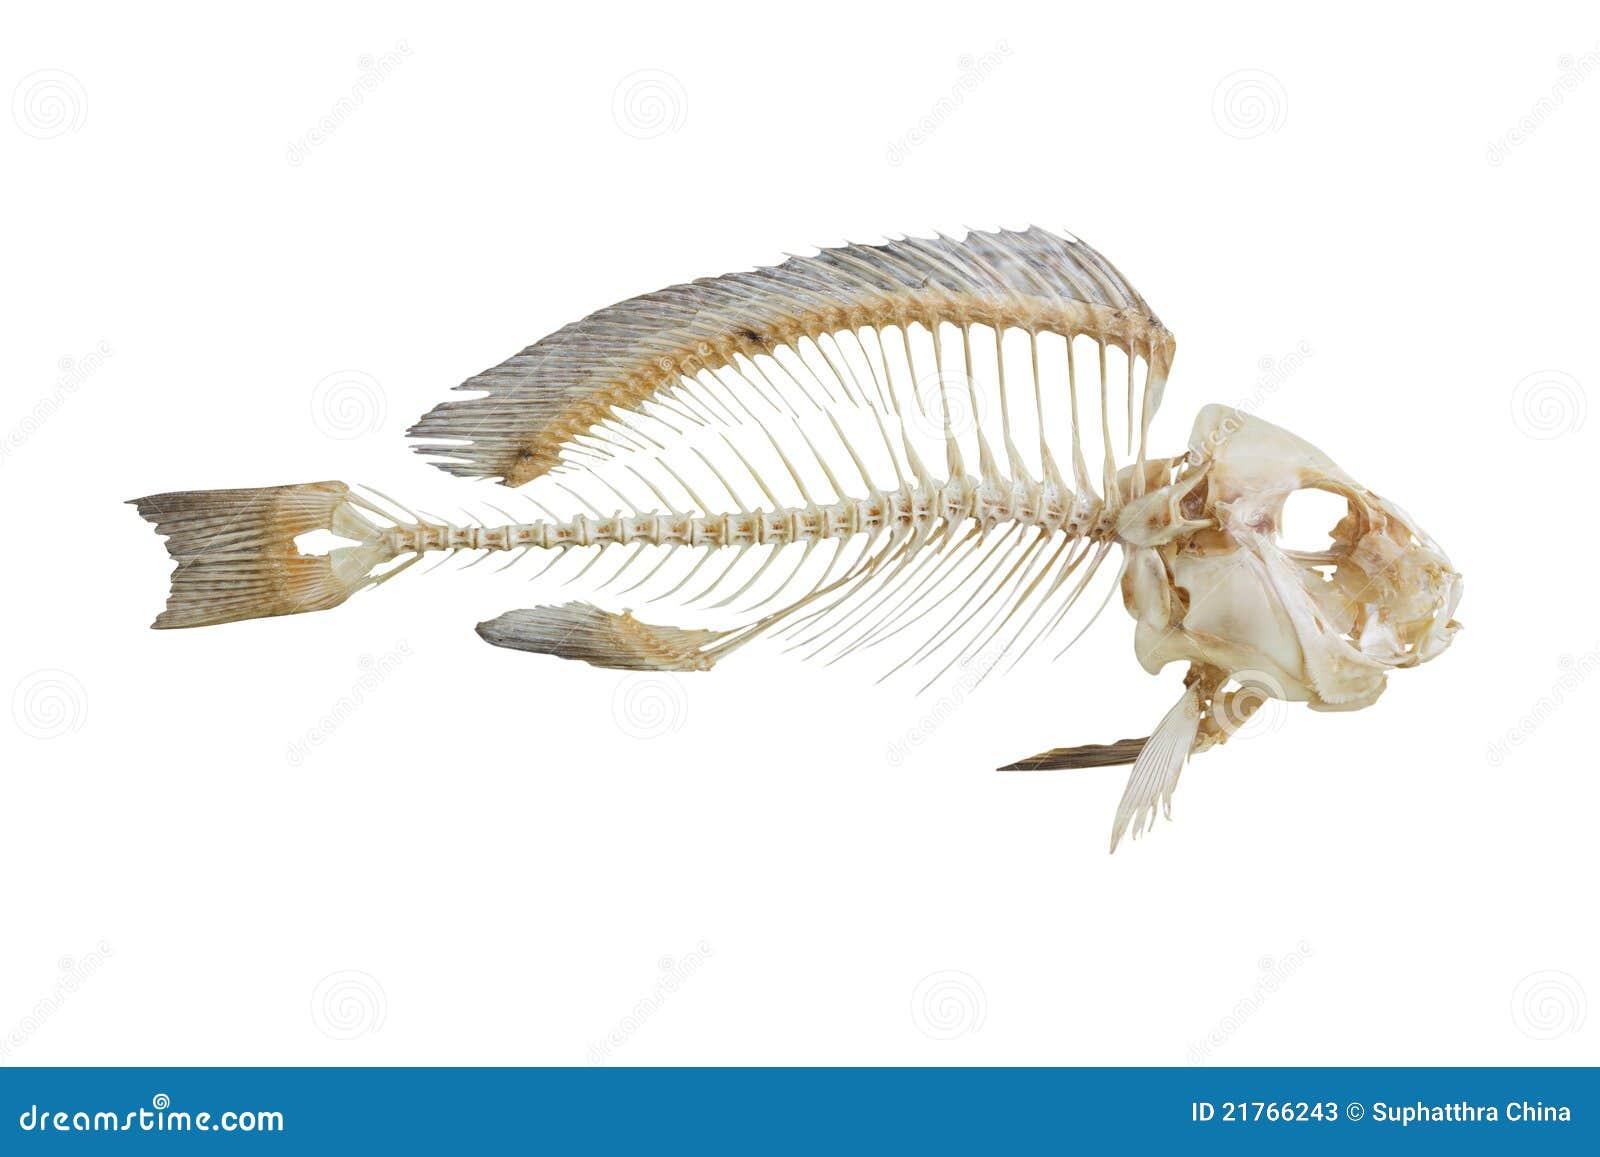 Fish Bone Stock Photos - Image: 21766243